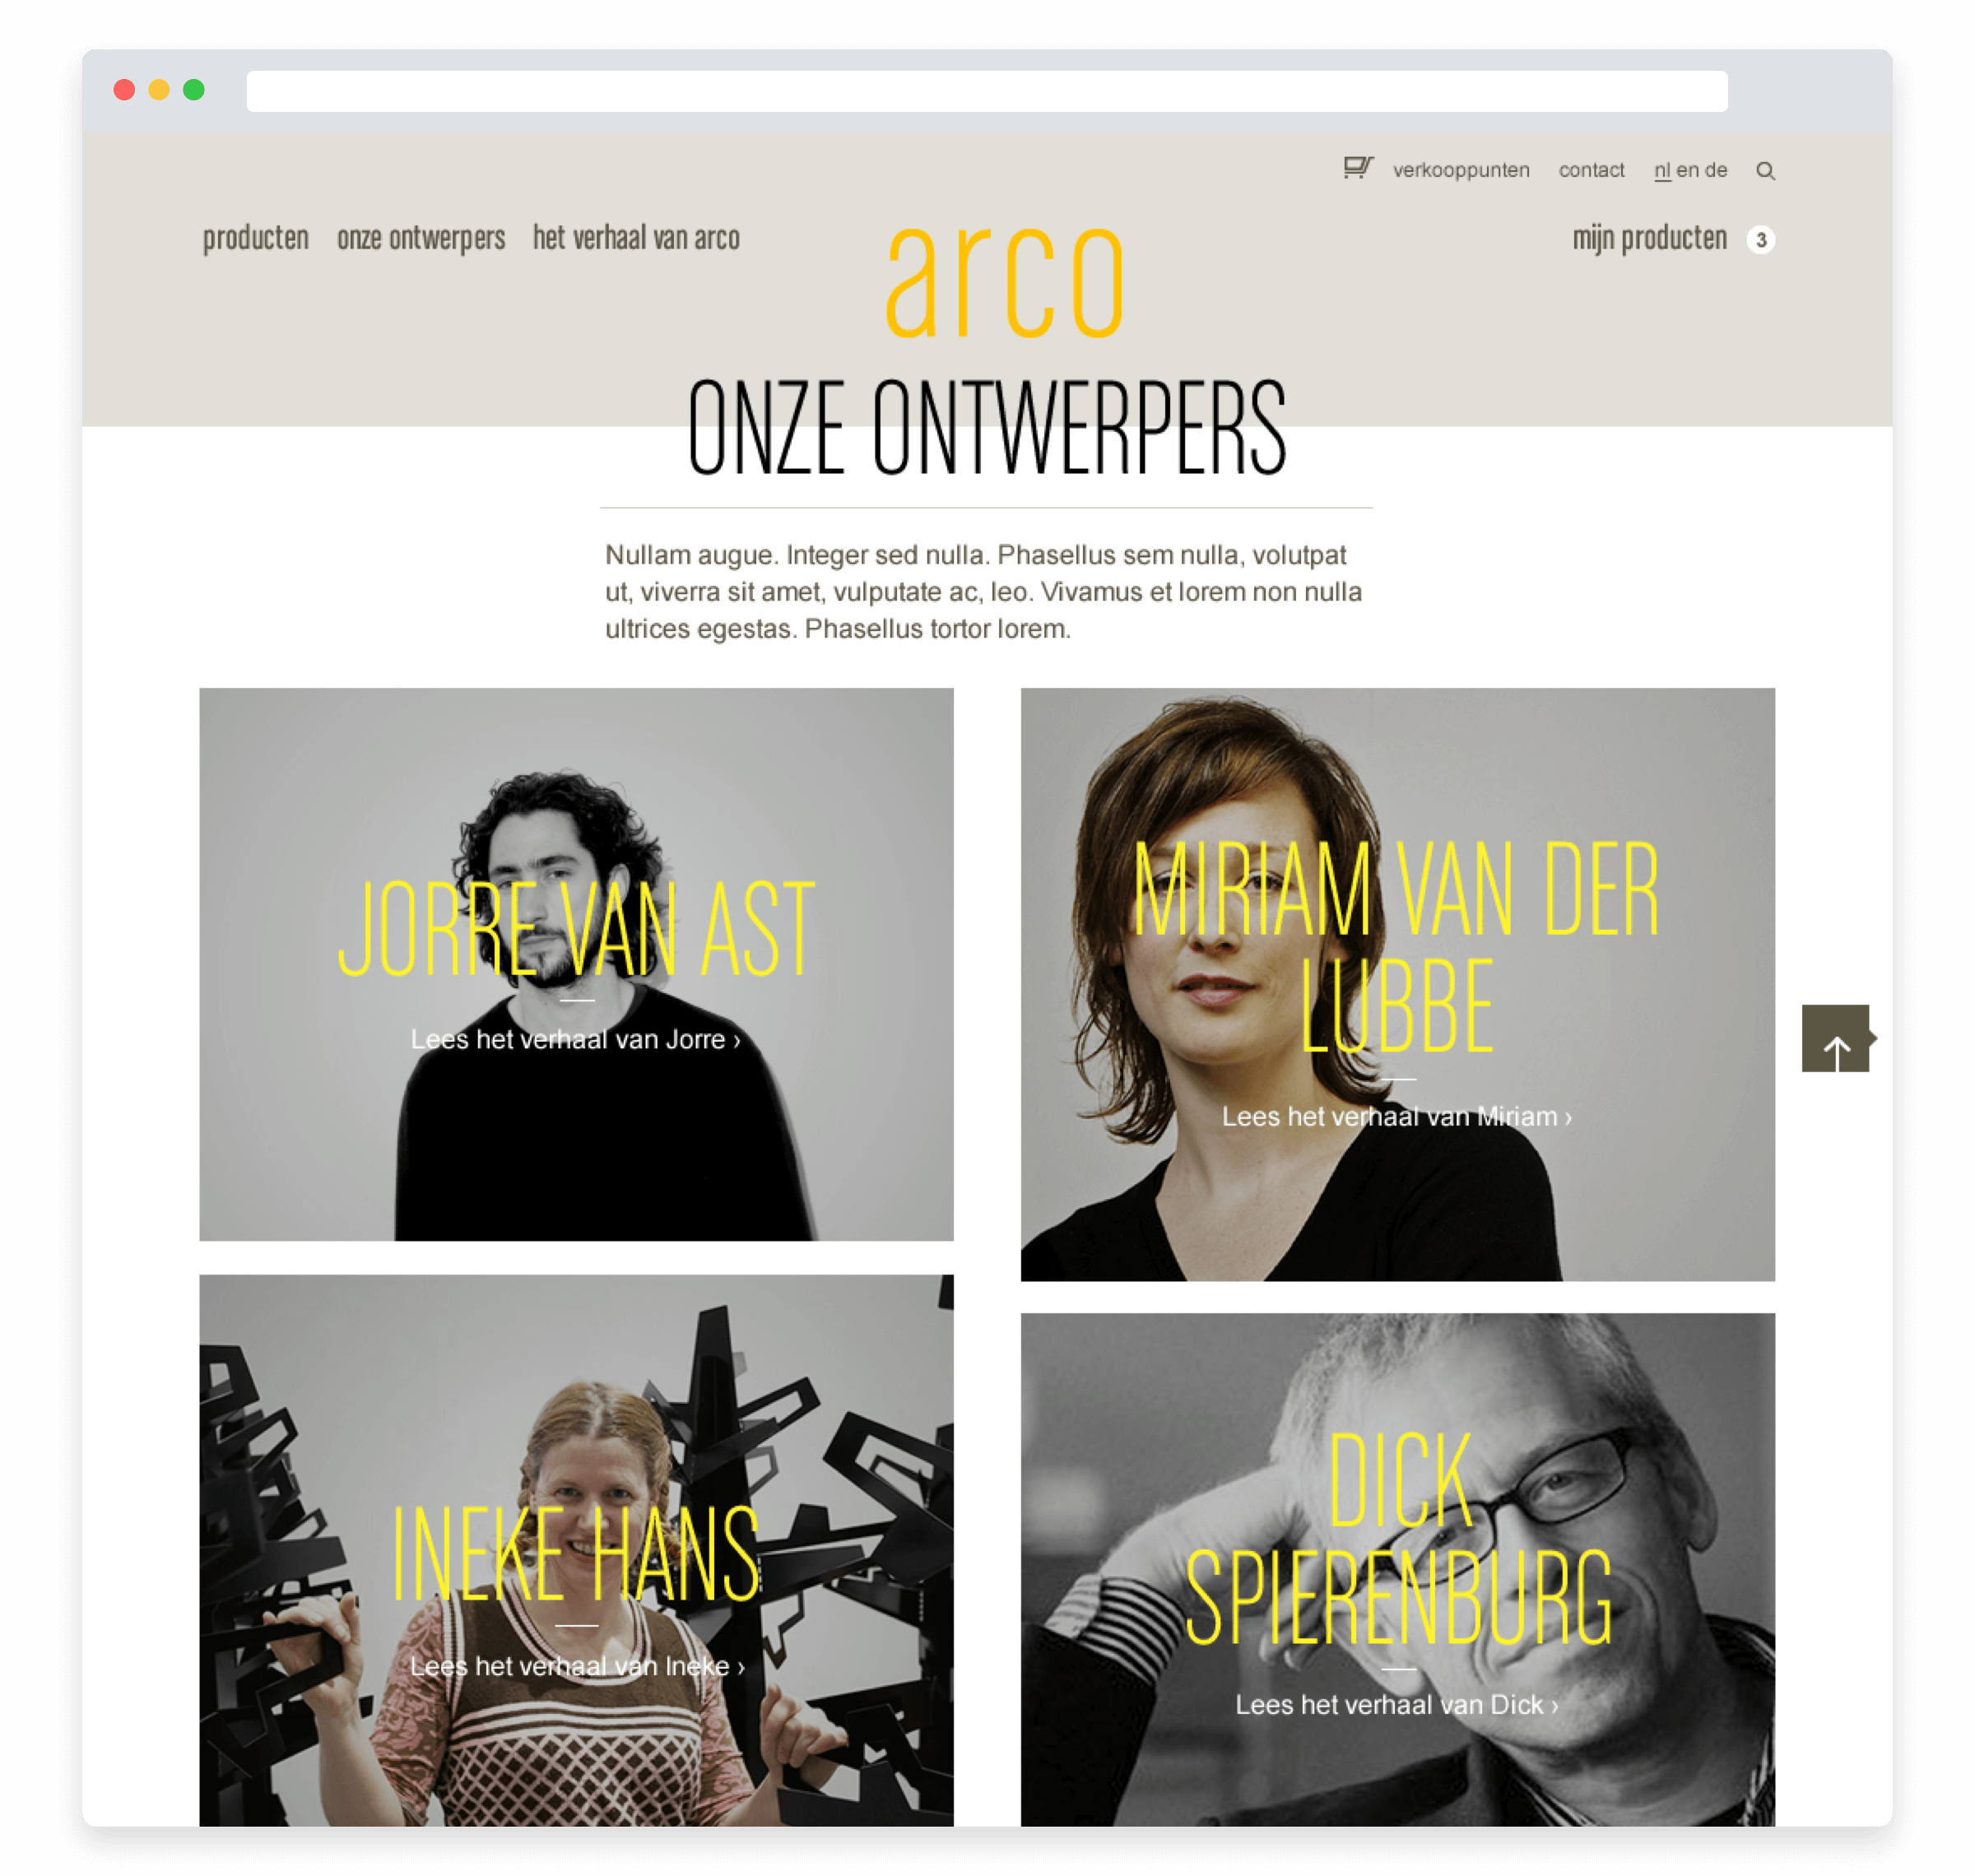 Arco website, designer overview